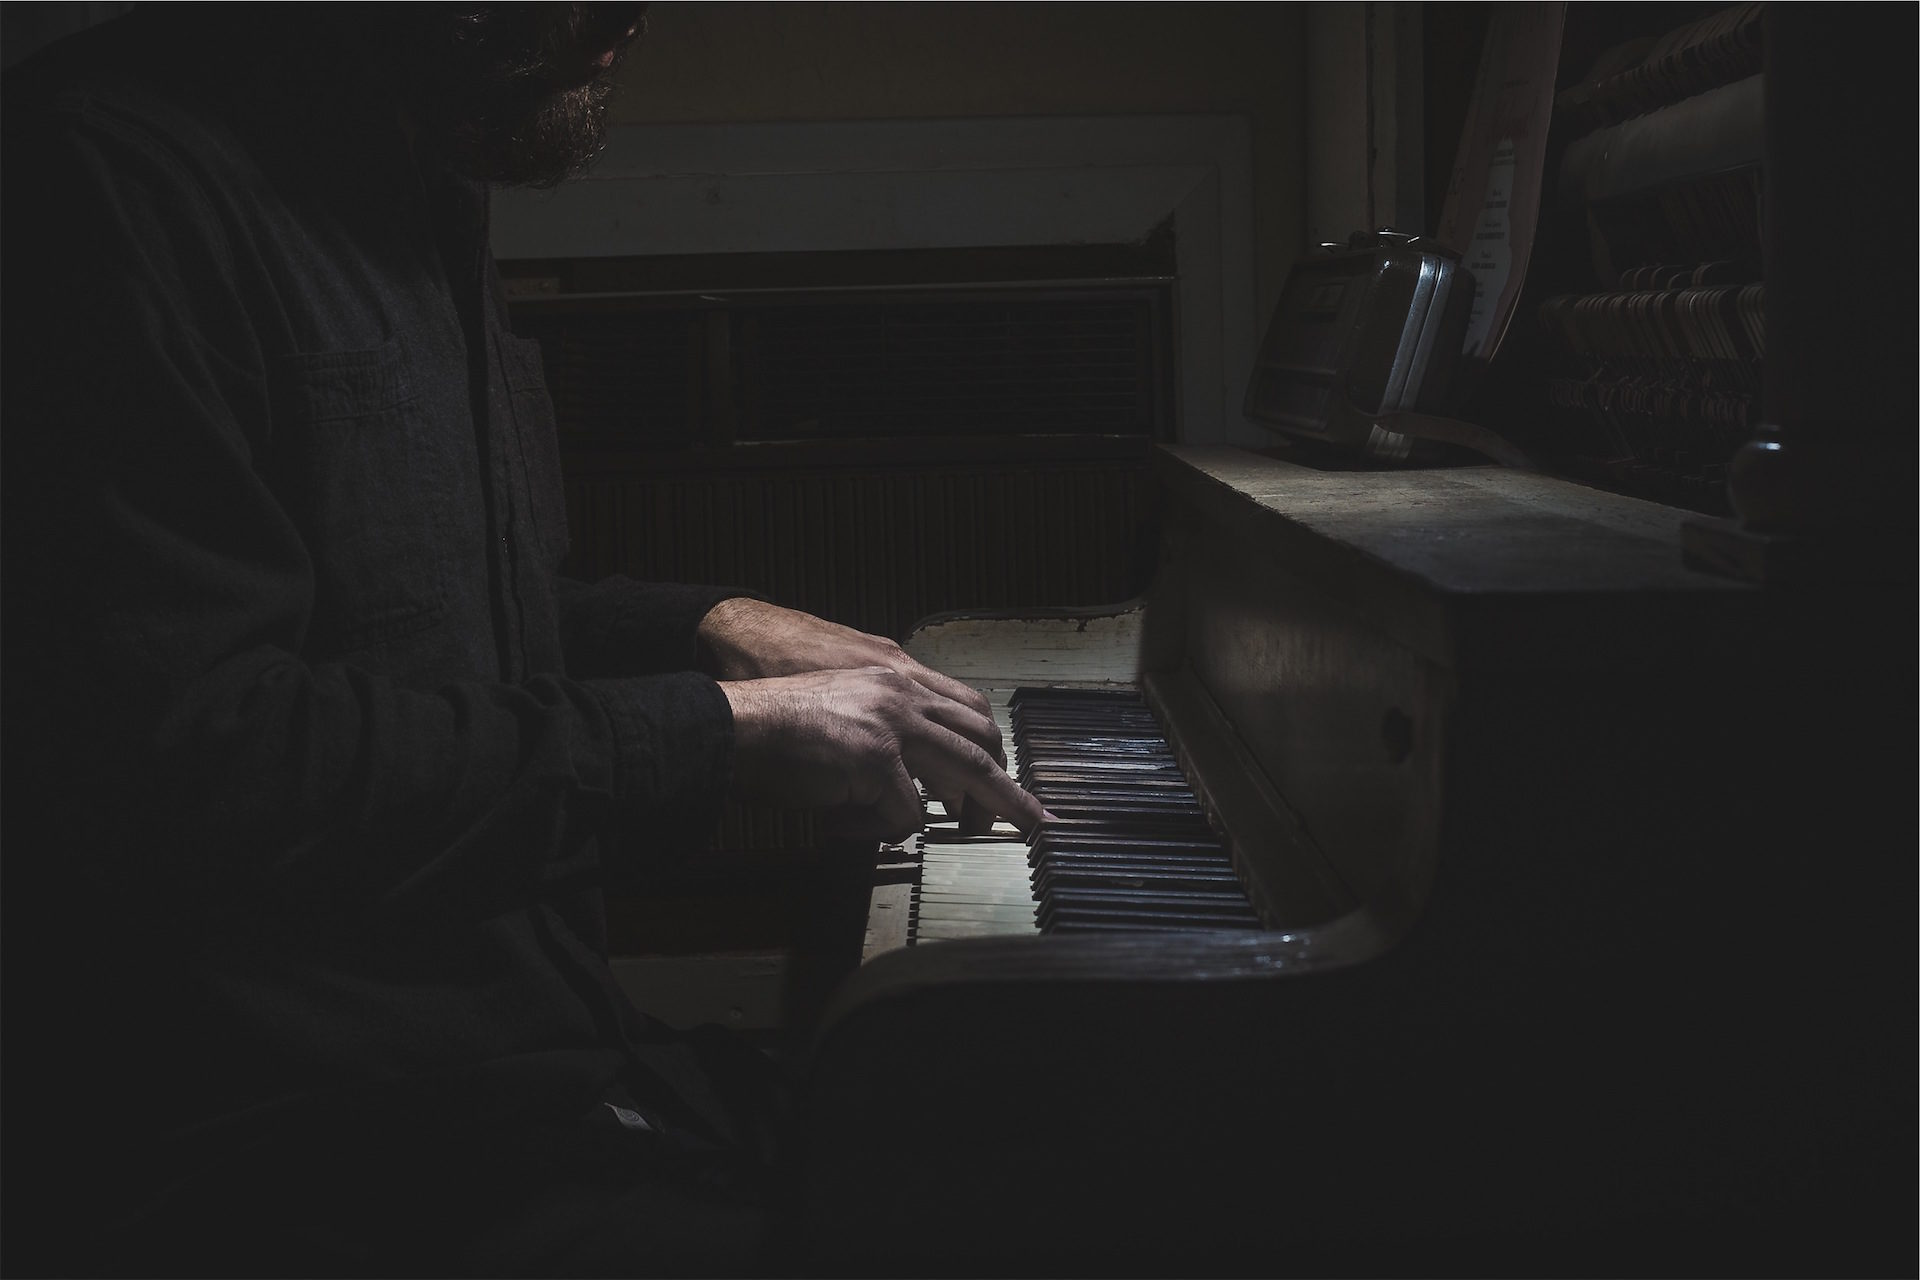 Klavier, alt, Mann, músico, Schlüssel - Wallpaper HD - Prof.-falken.com